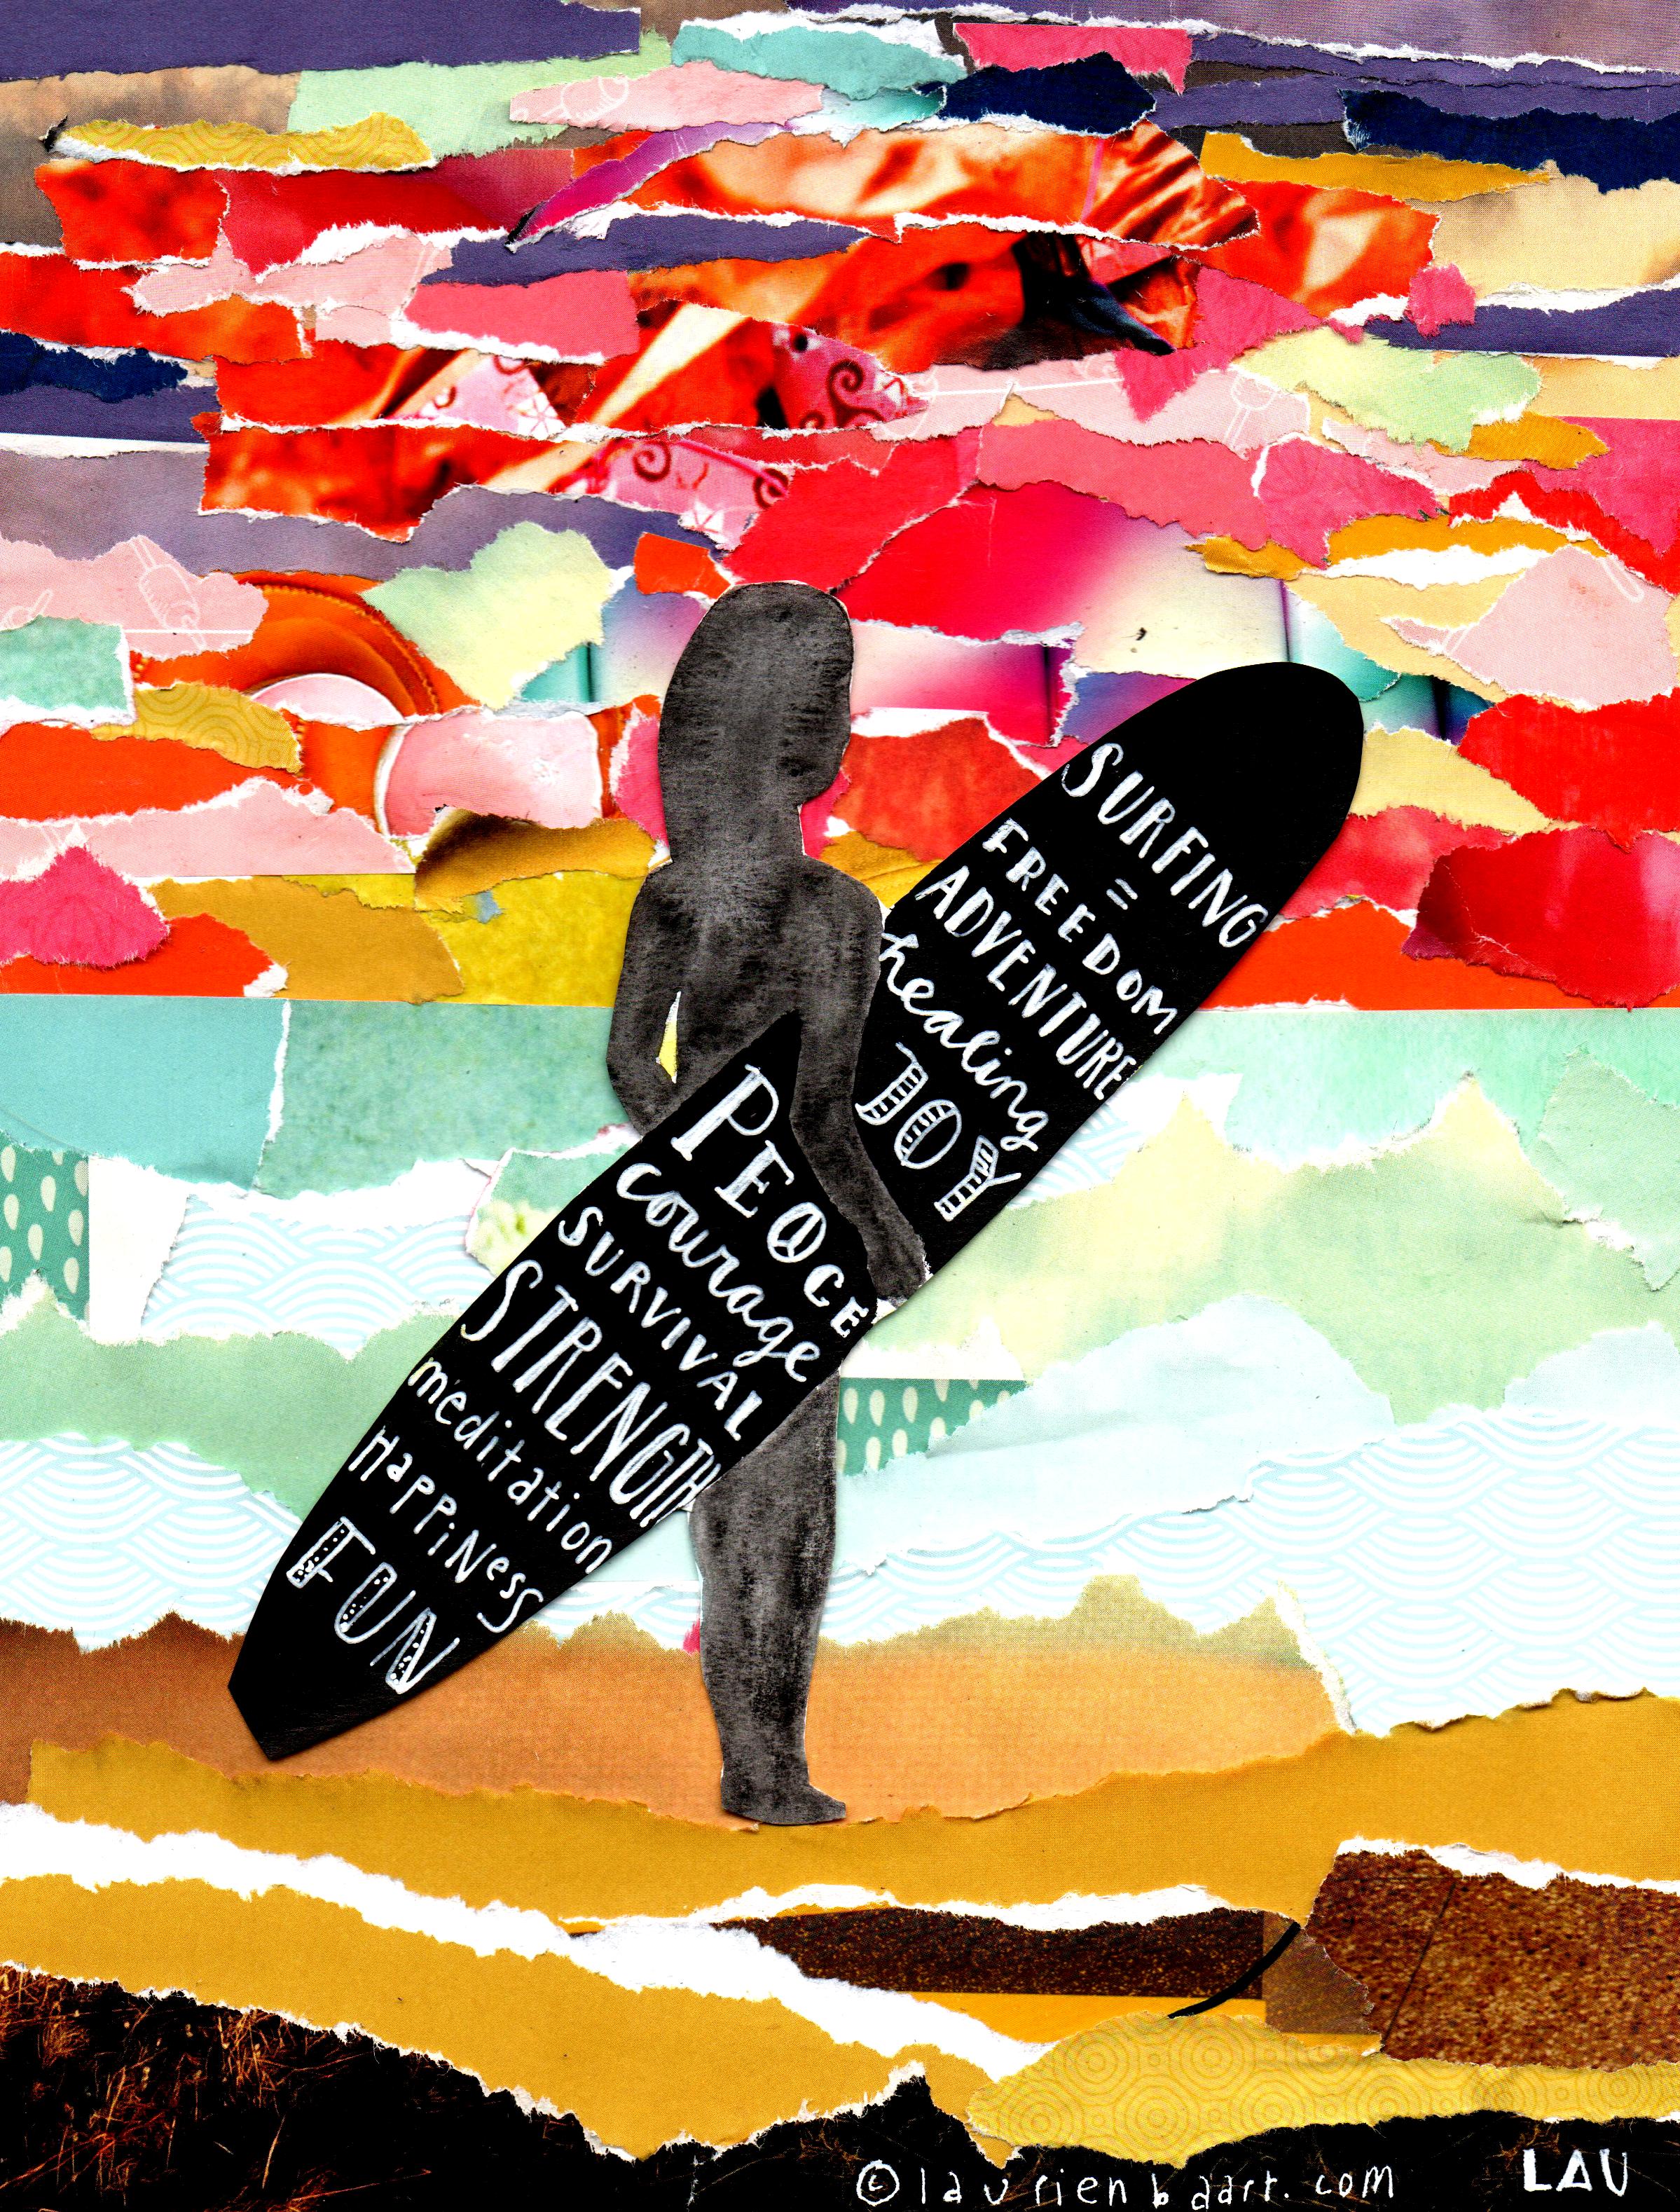 Surfing is... Laurien Baart